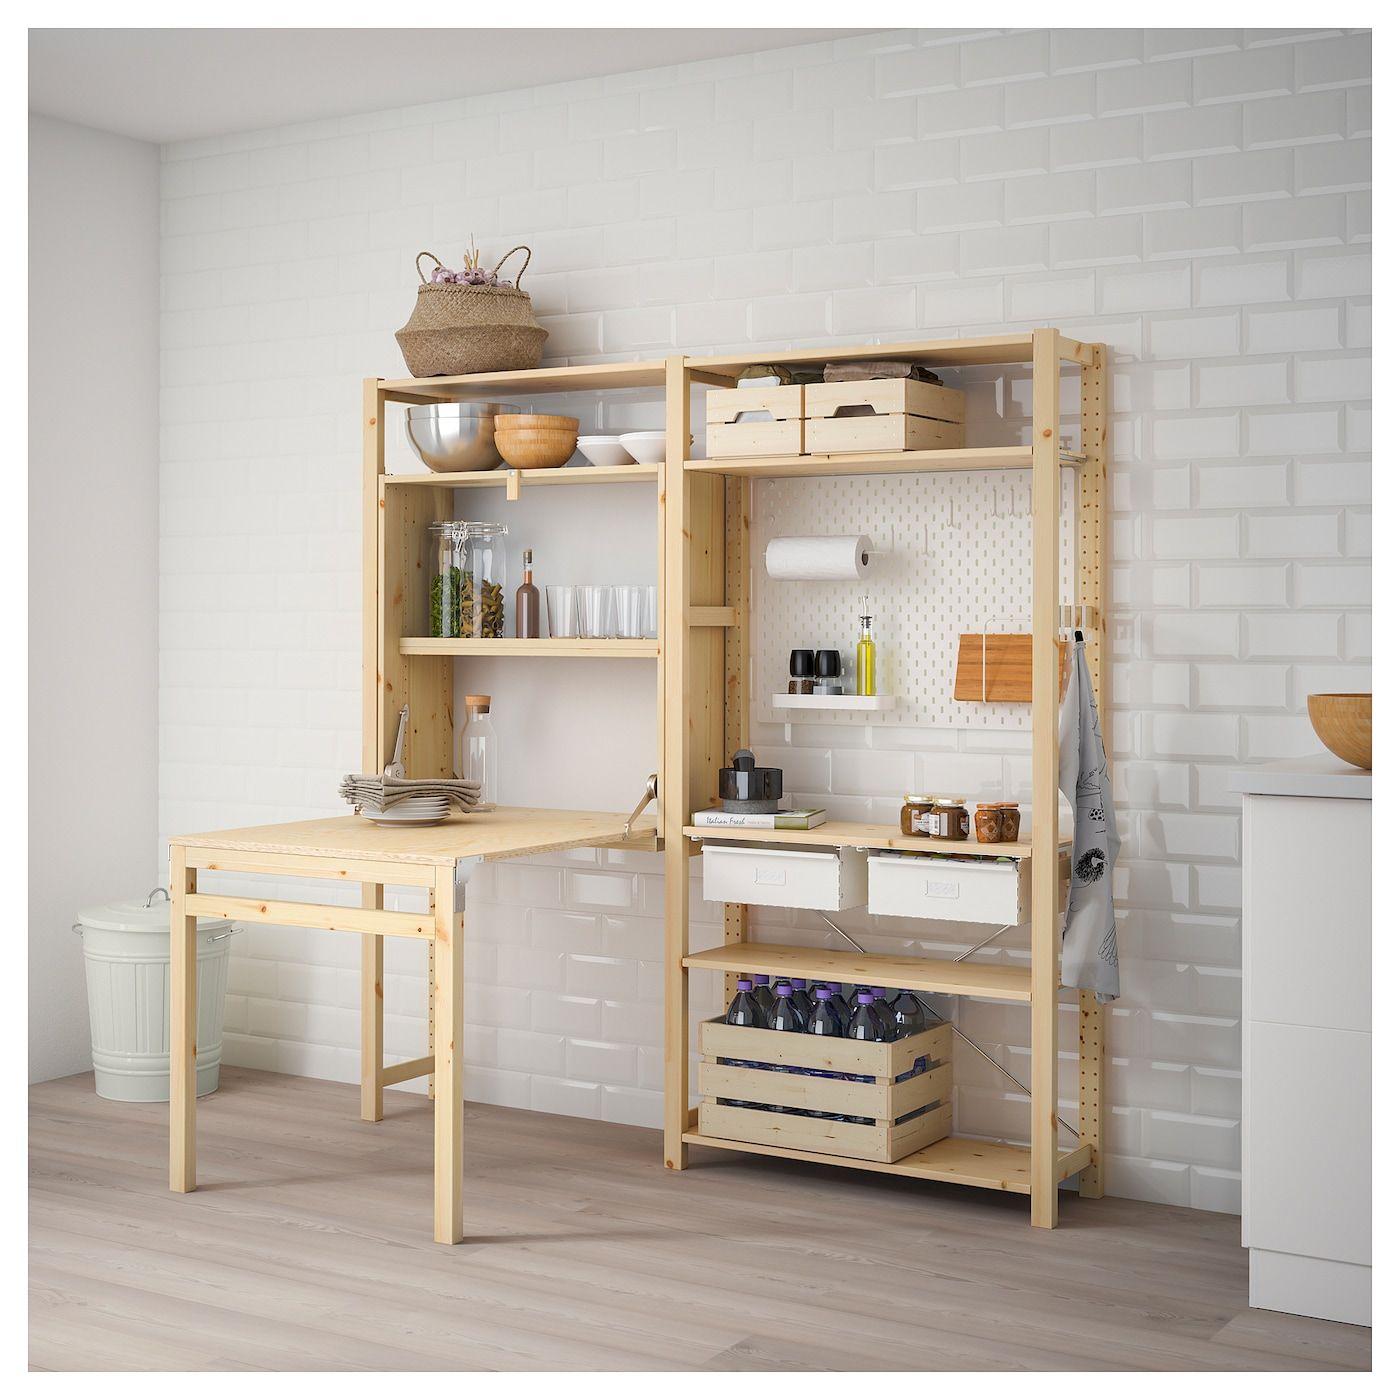 Ivar 2 Section Unit With Foldable Table Pine White Ikea In 2020 Fold Up Desk Ikea Ivar Ikea Shelving Unit